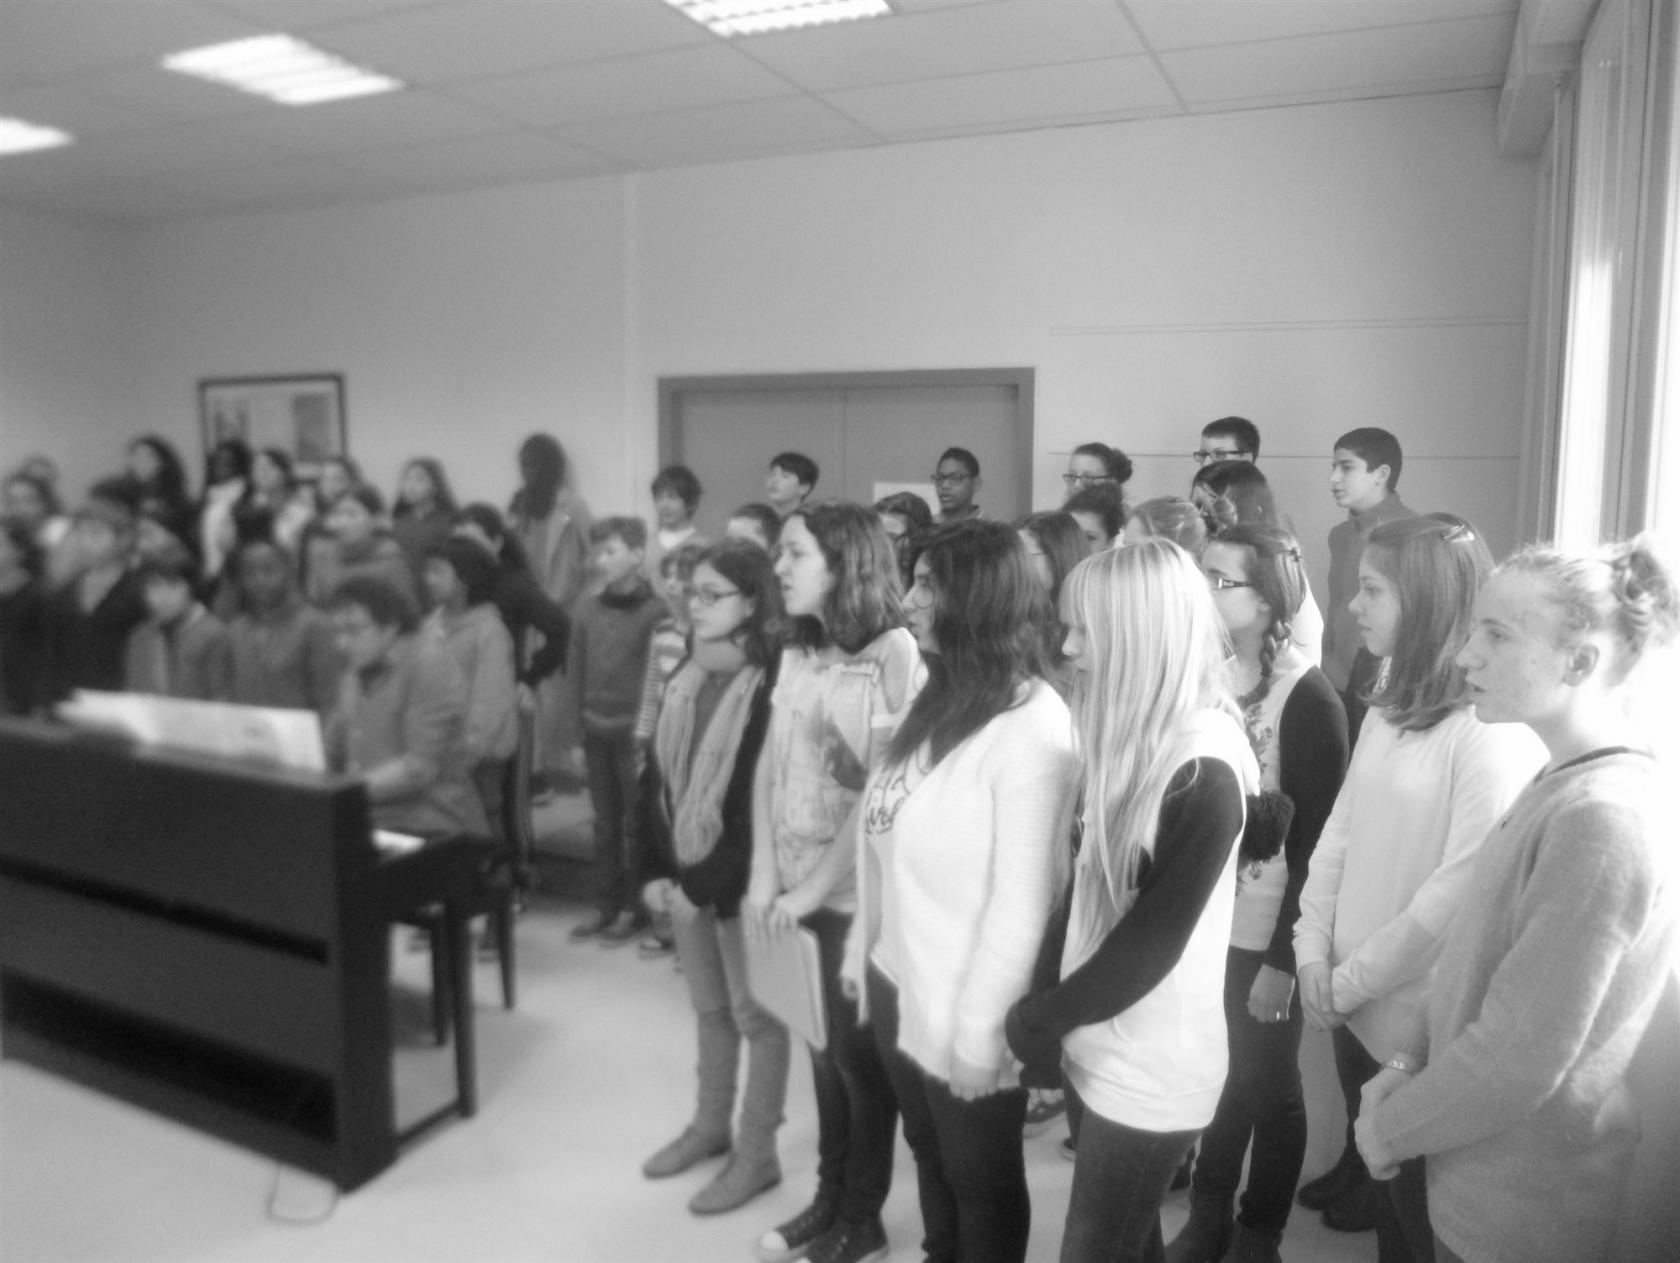 Chorale du collège Anna Marly de Brest Plougastel-Daoulas